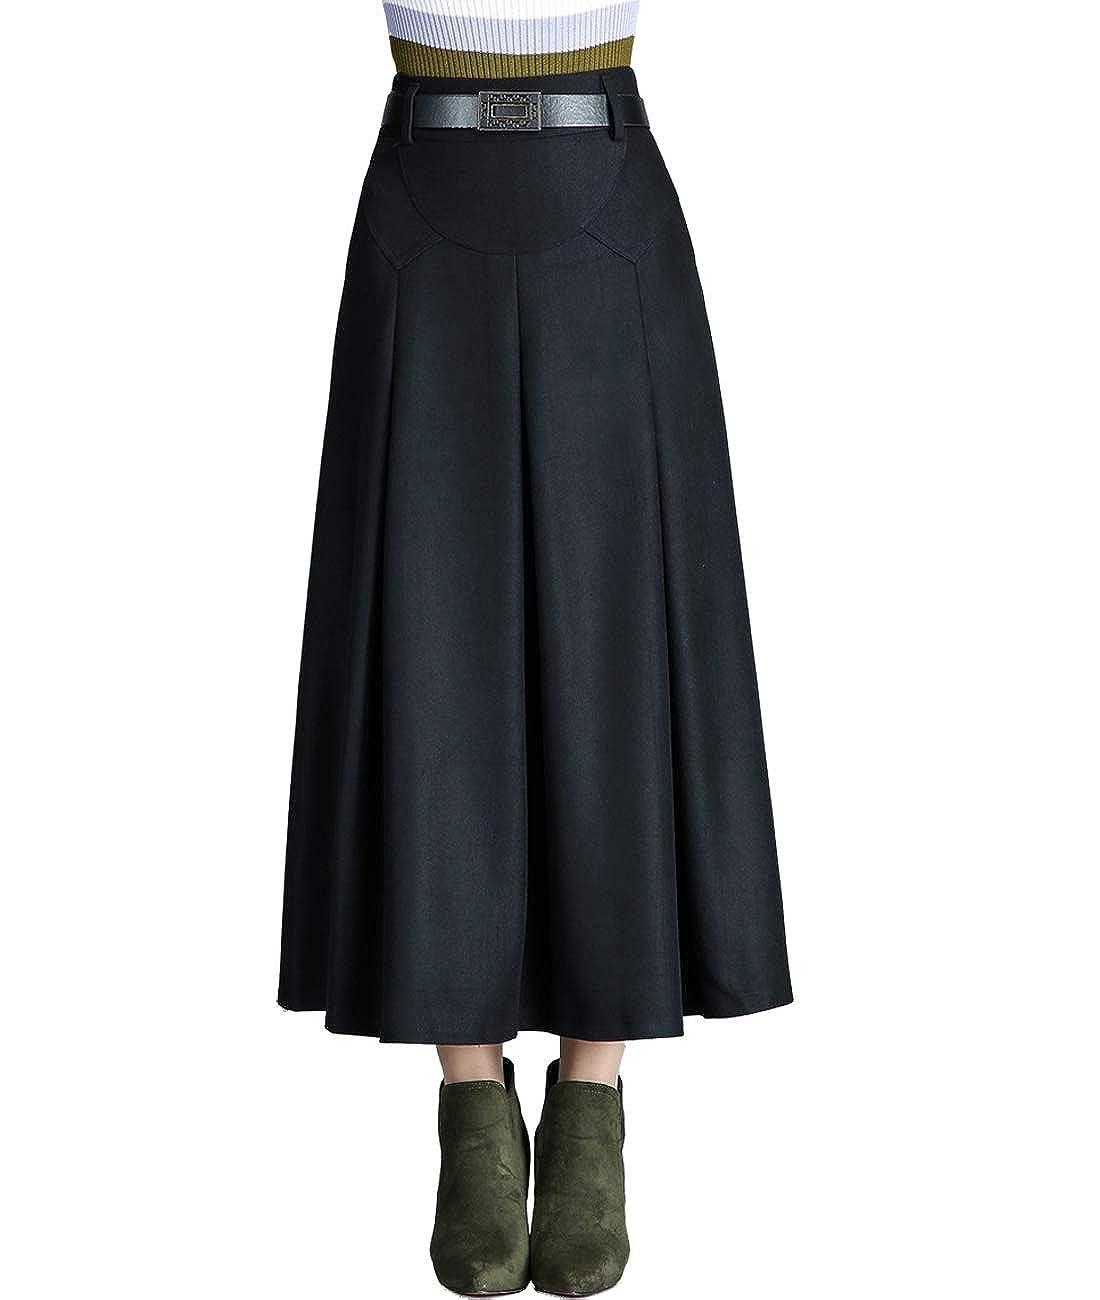 40fd86776b Femirah Women's Autumn Winter Long Pleated Wool Skirt with Pockets: Amazon. co.uk: Clothing